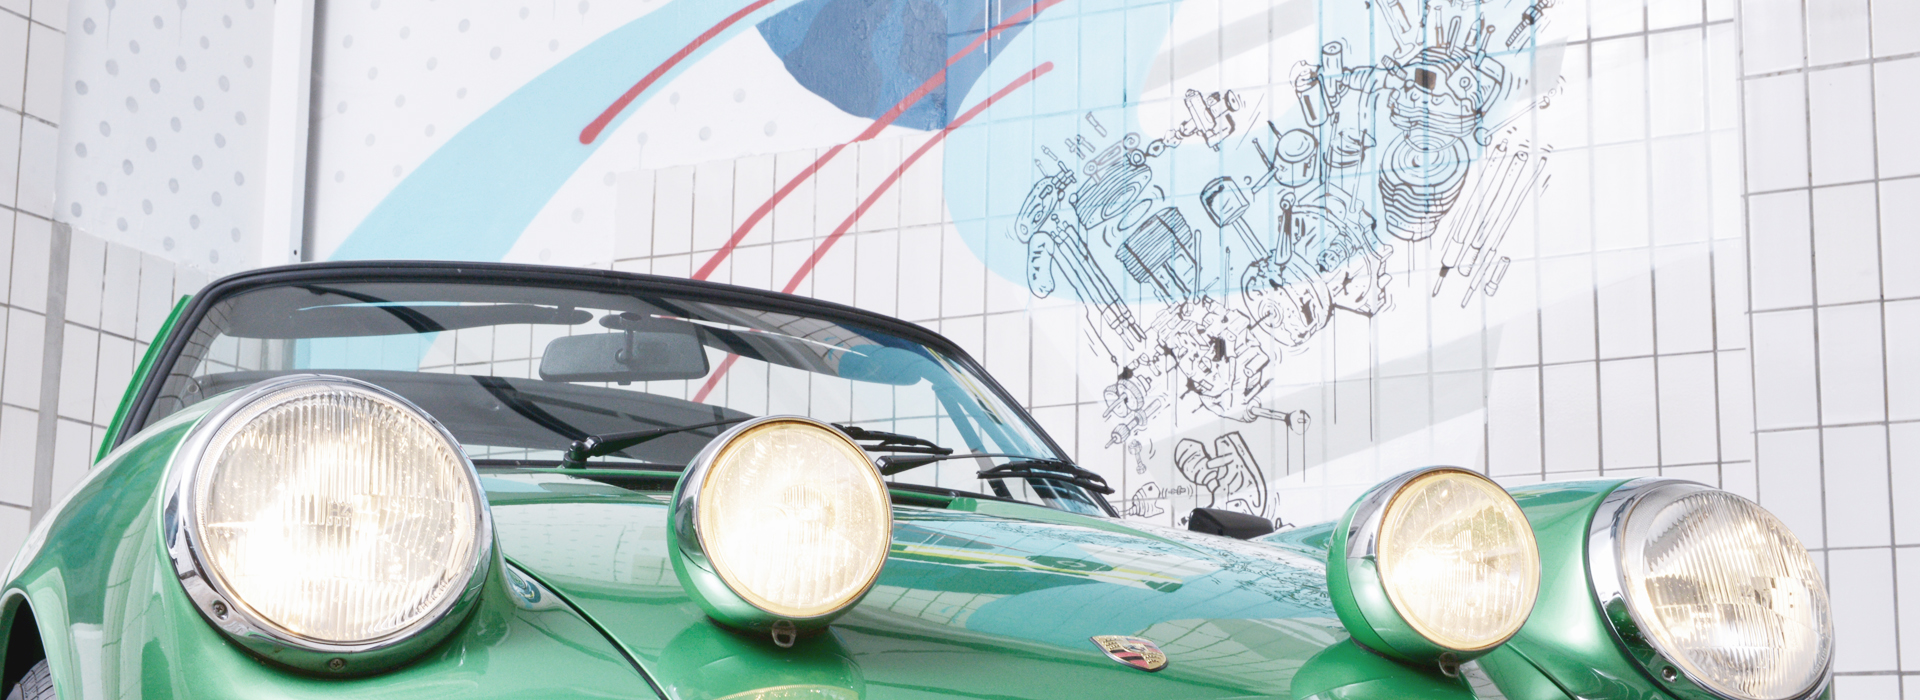 Bastian Hubald Auto mit Wandbemalung im Hintergrund